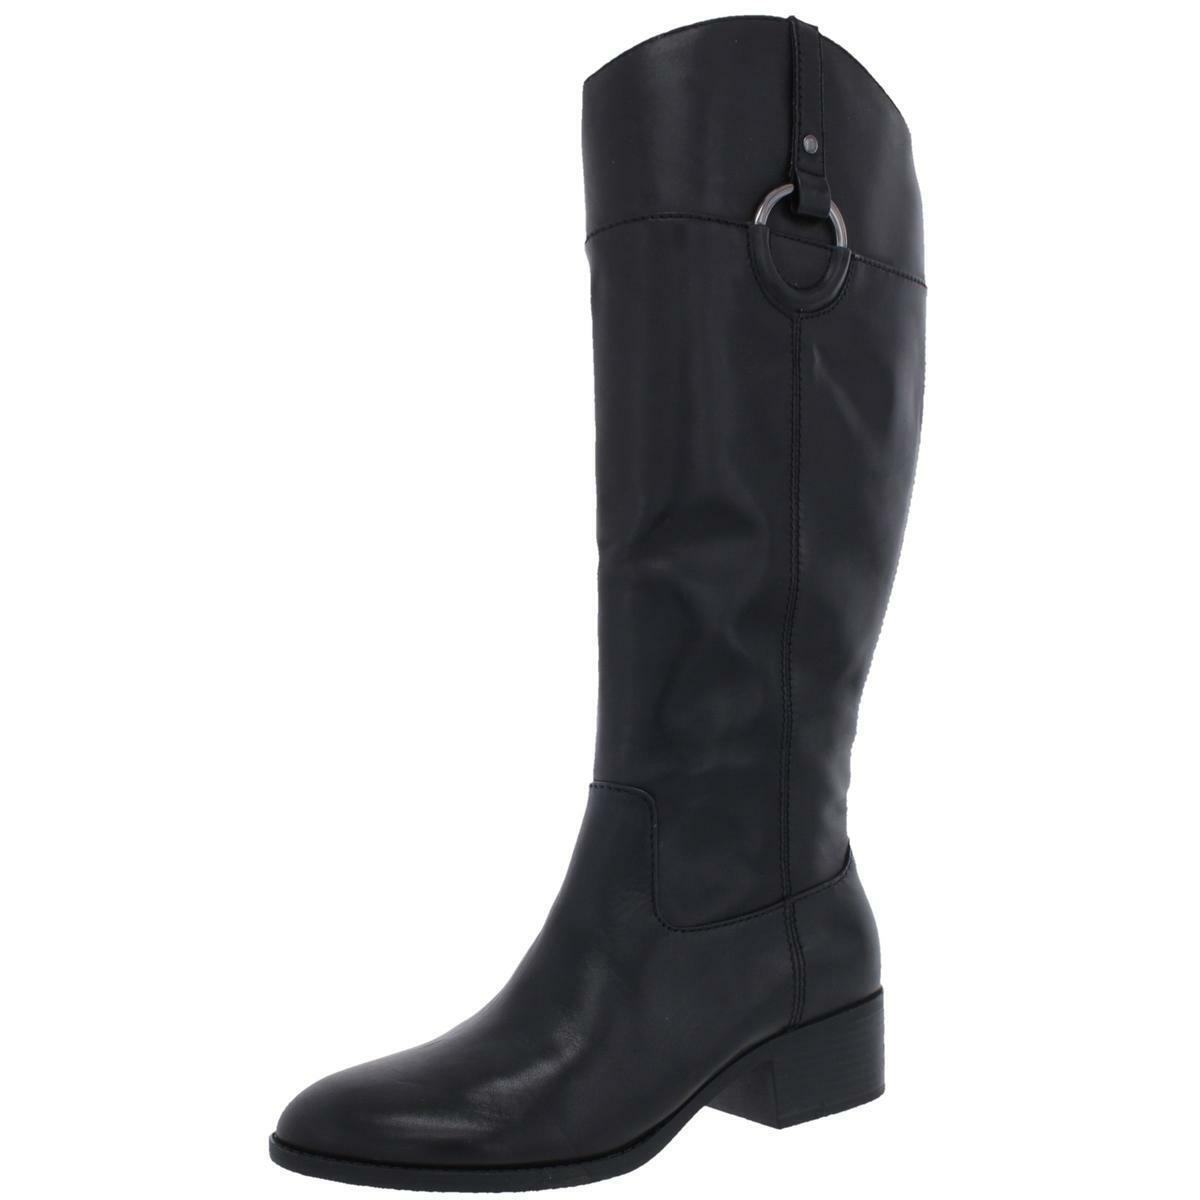 Alfani Femme bexleyy Cuir Noir Équitation Bottes Chaussures 7 moyen (B, M) BHFO 5426